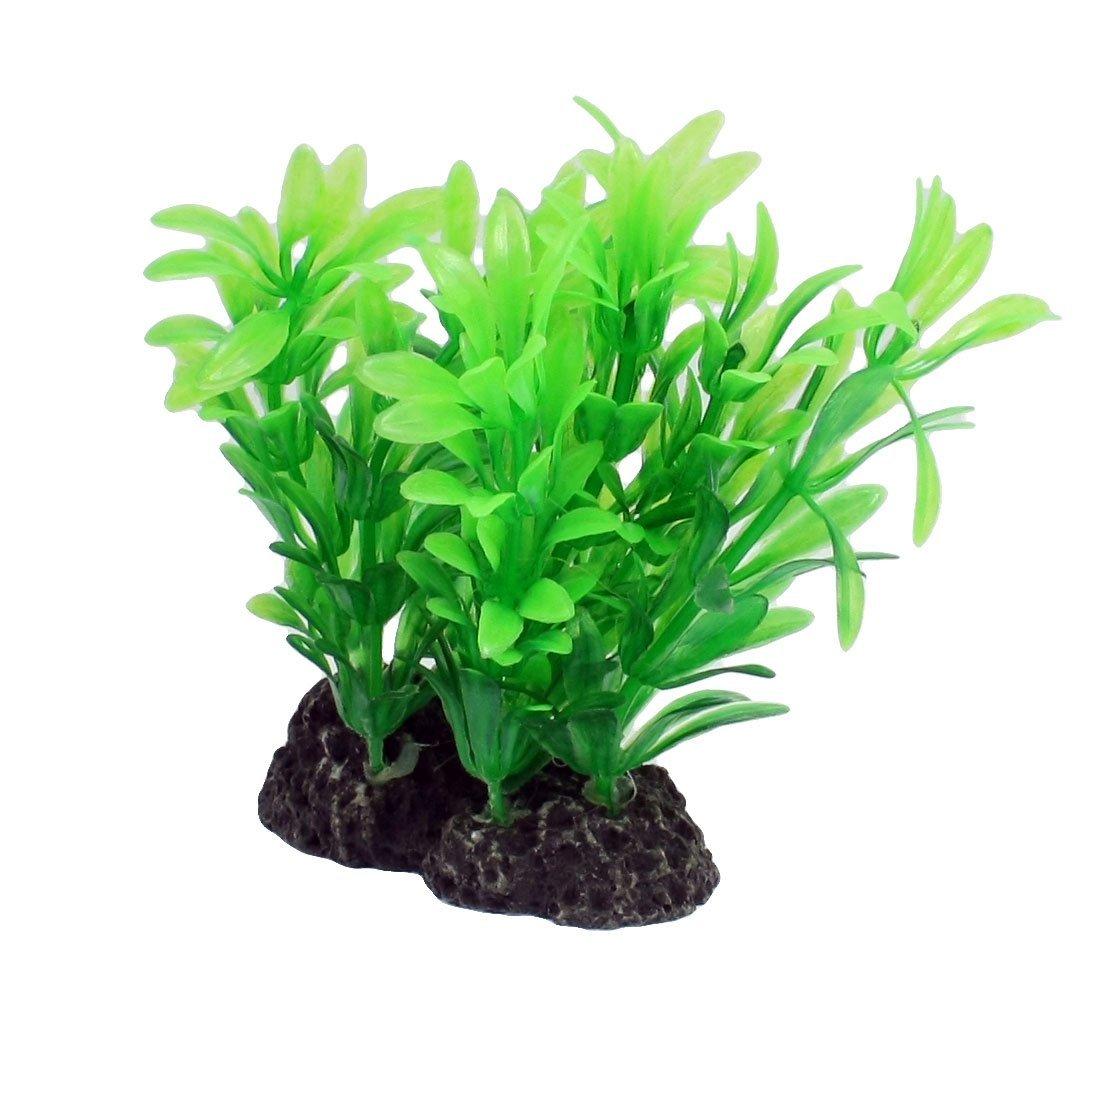 5 Pcs Aquarium Tank Green Plastic Grass Plant 4.3  Height w Ceramic Base